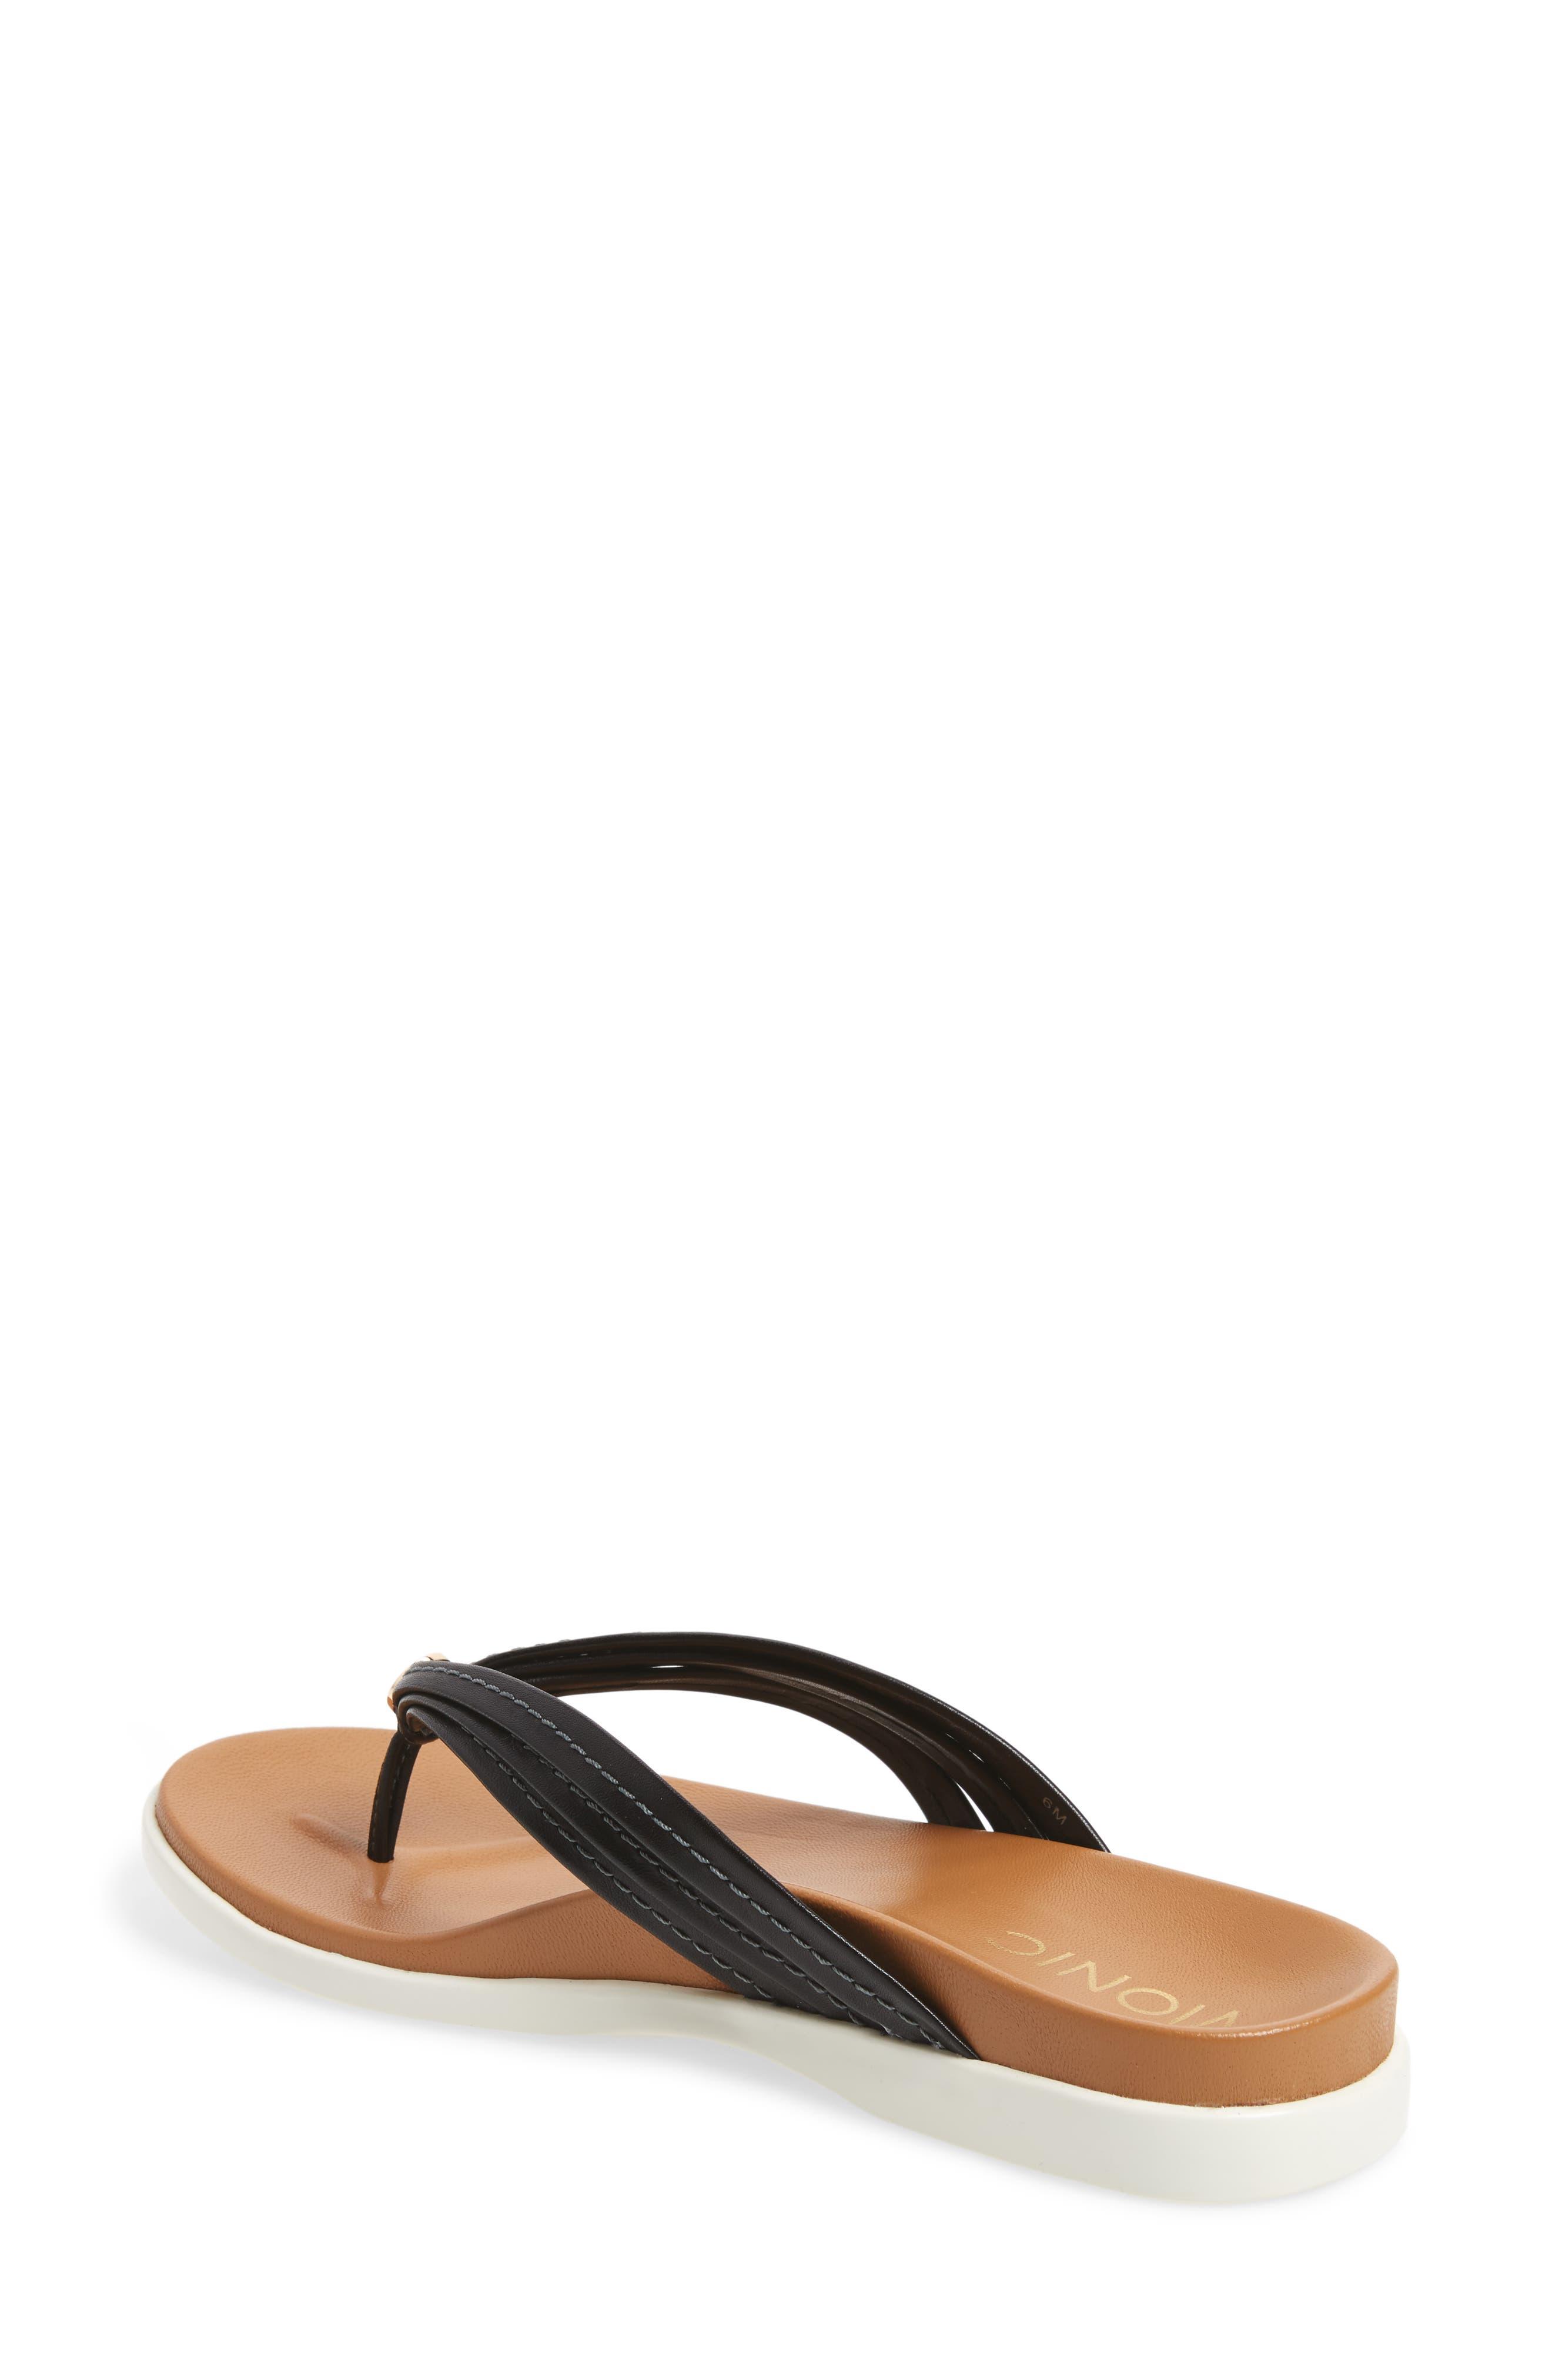 Catalina Flip Flop,                             Alternate thumbnail 2, color,                             Black Leather